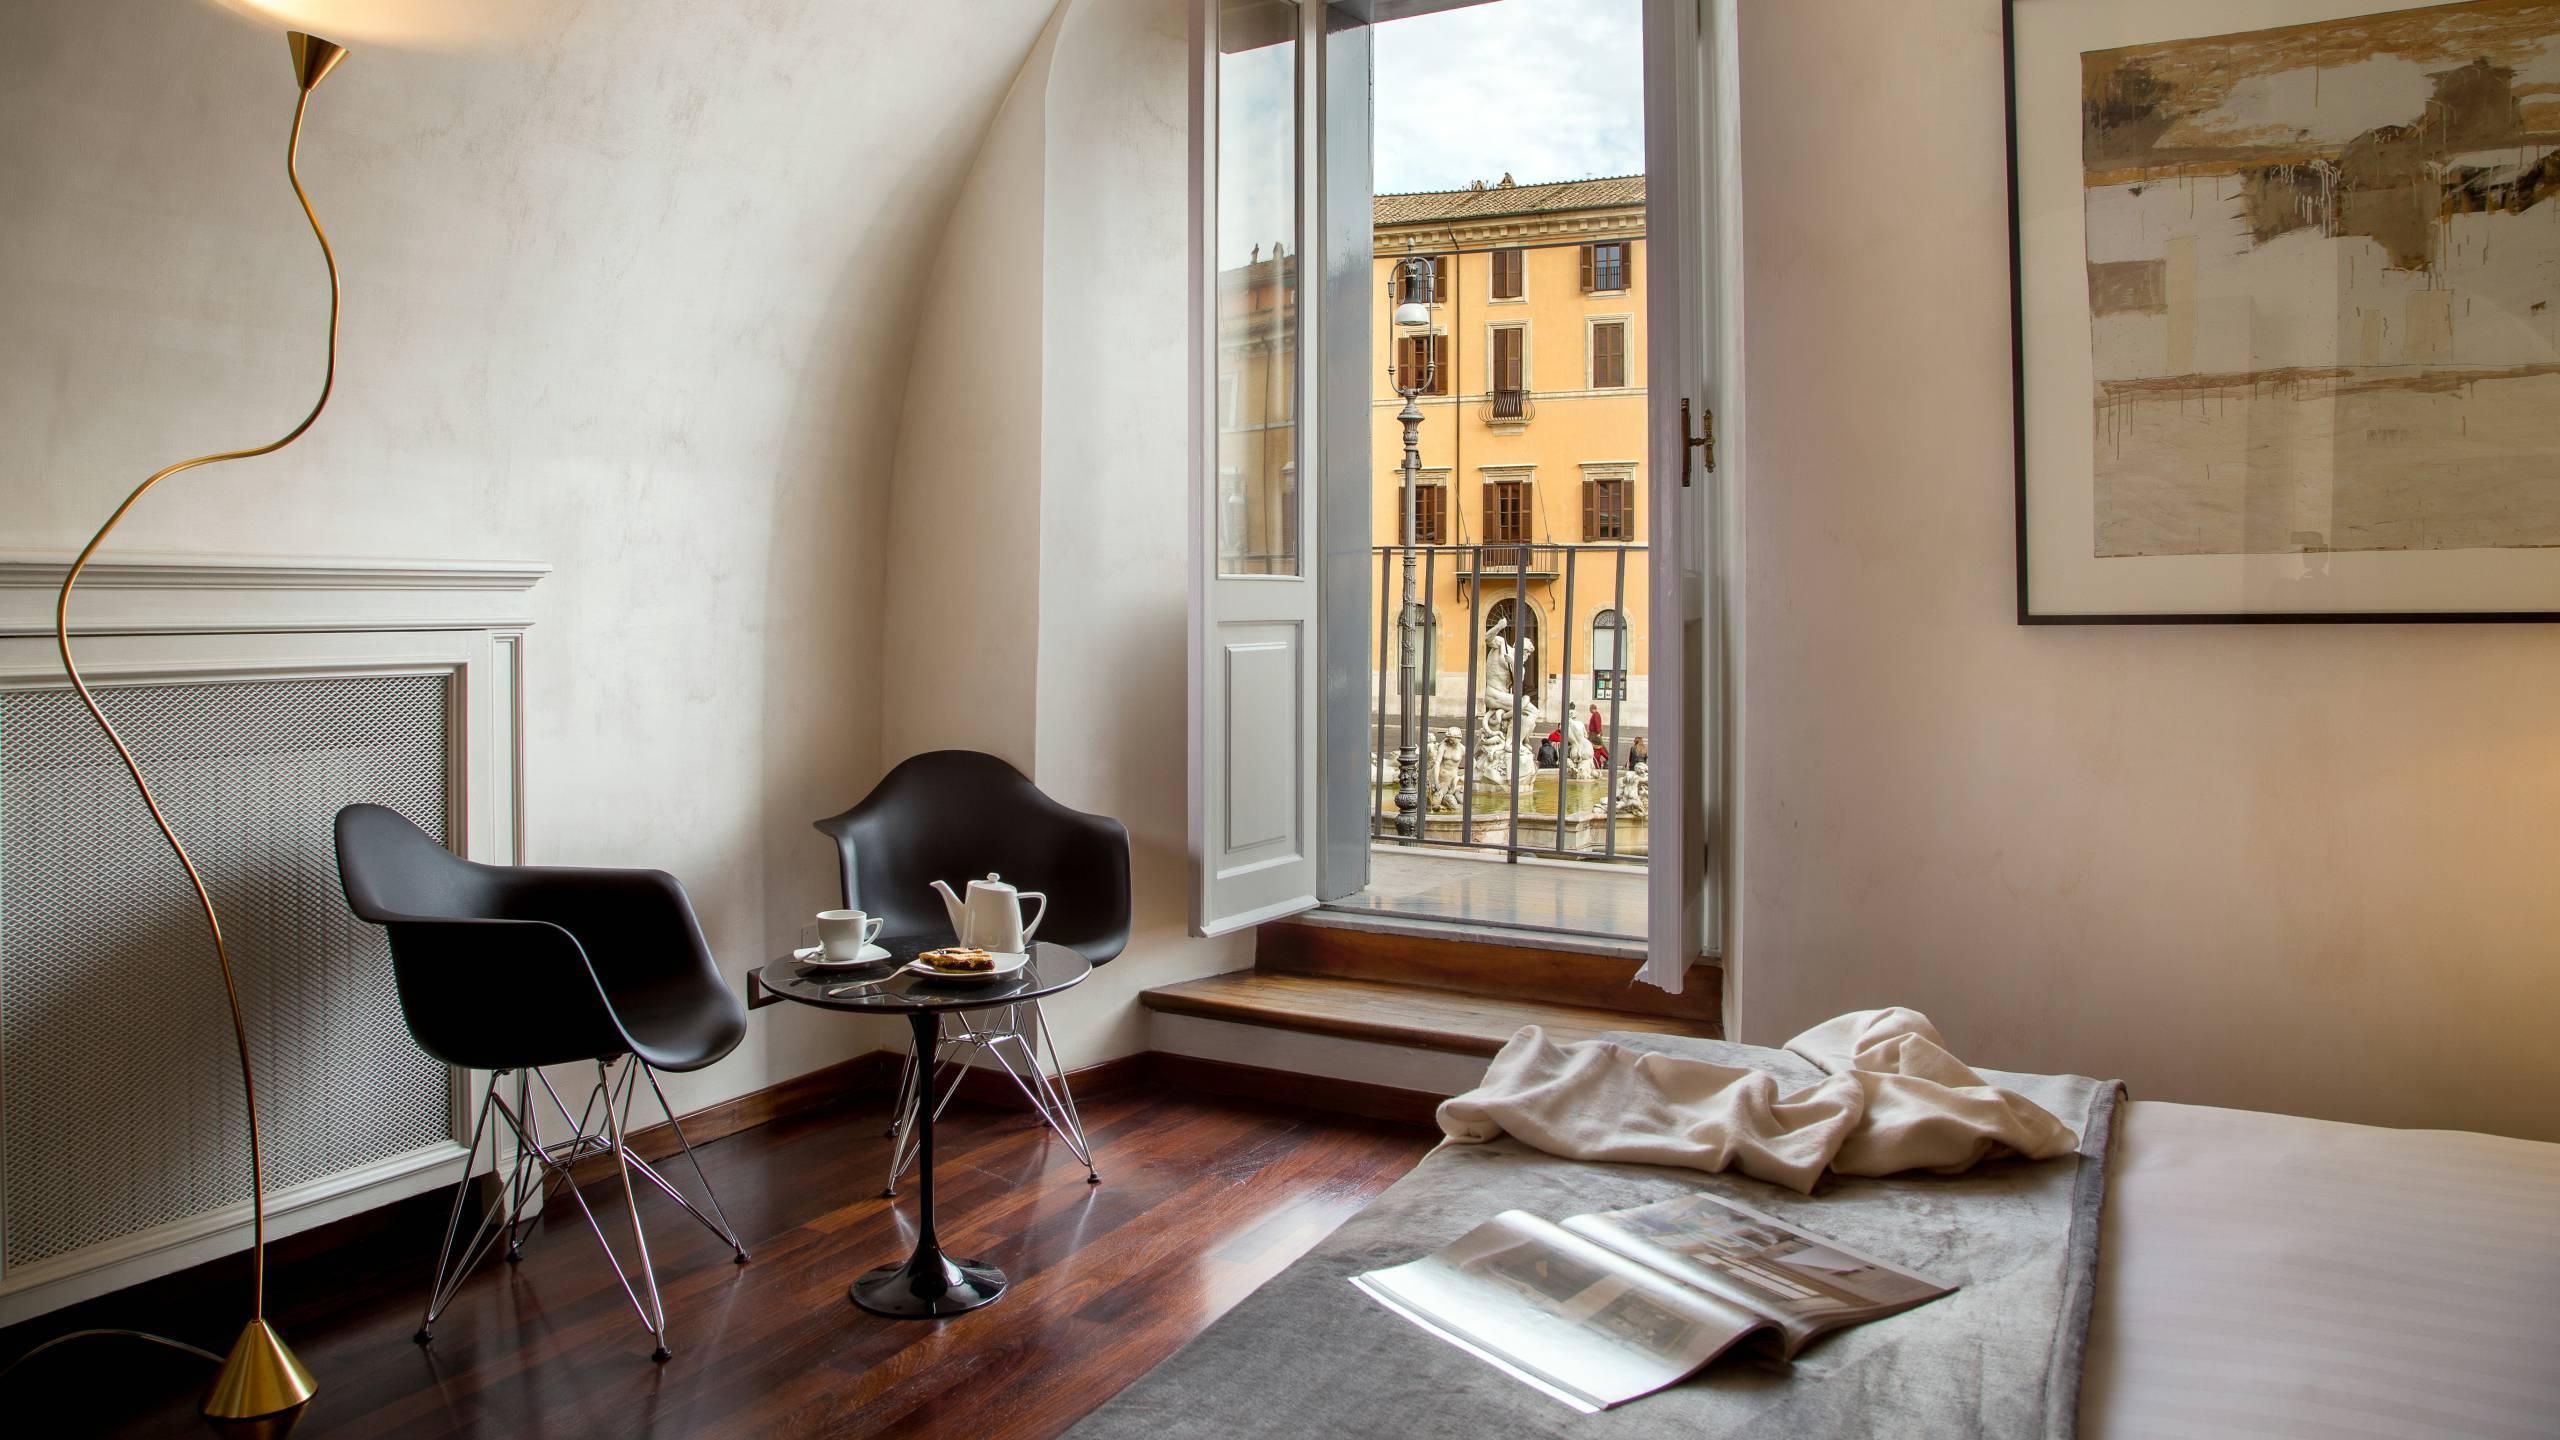 palazzo-de-cupis-roma-suite11